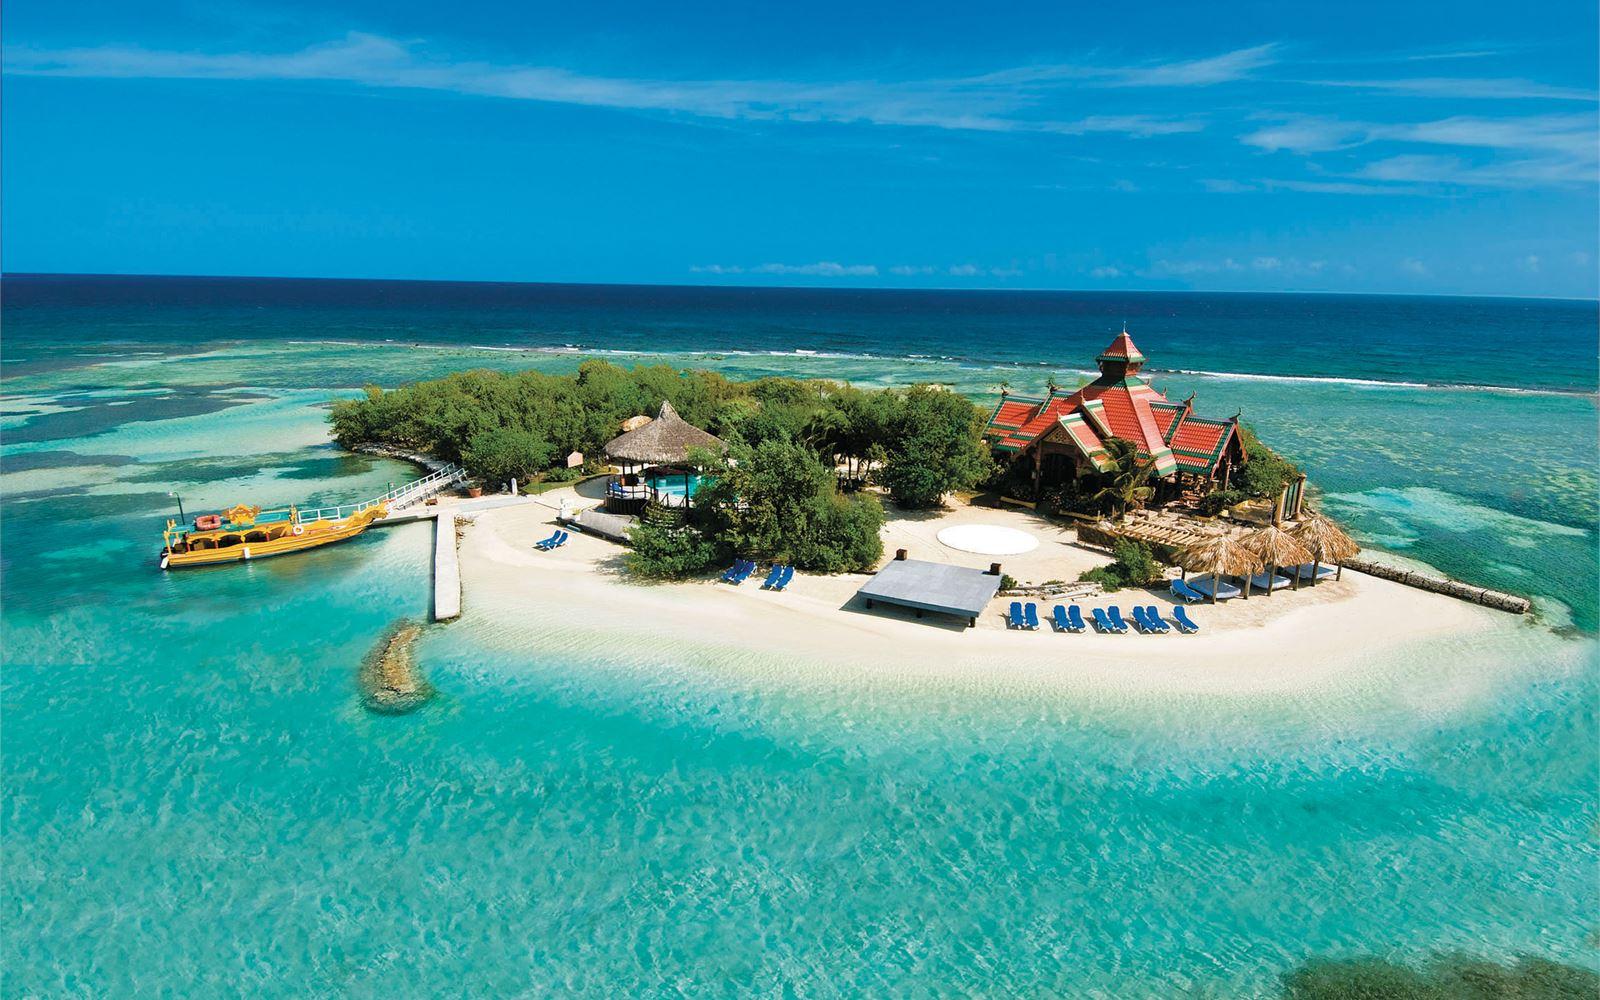 Sandals, Carribbean